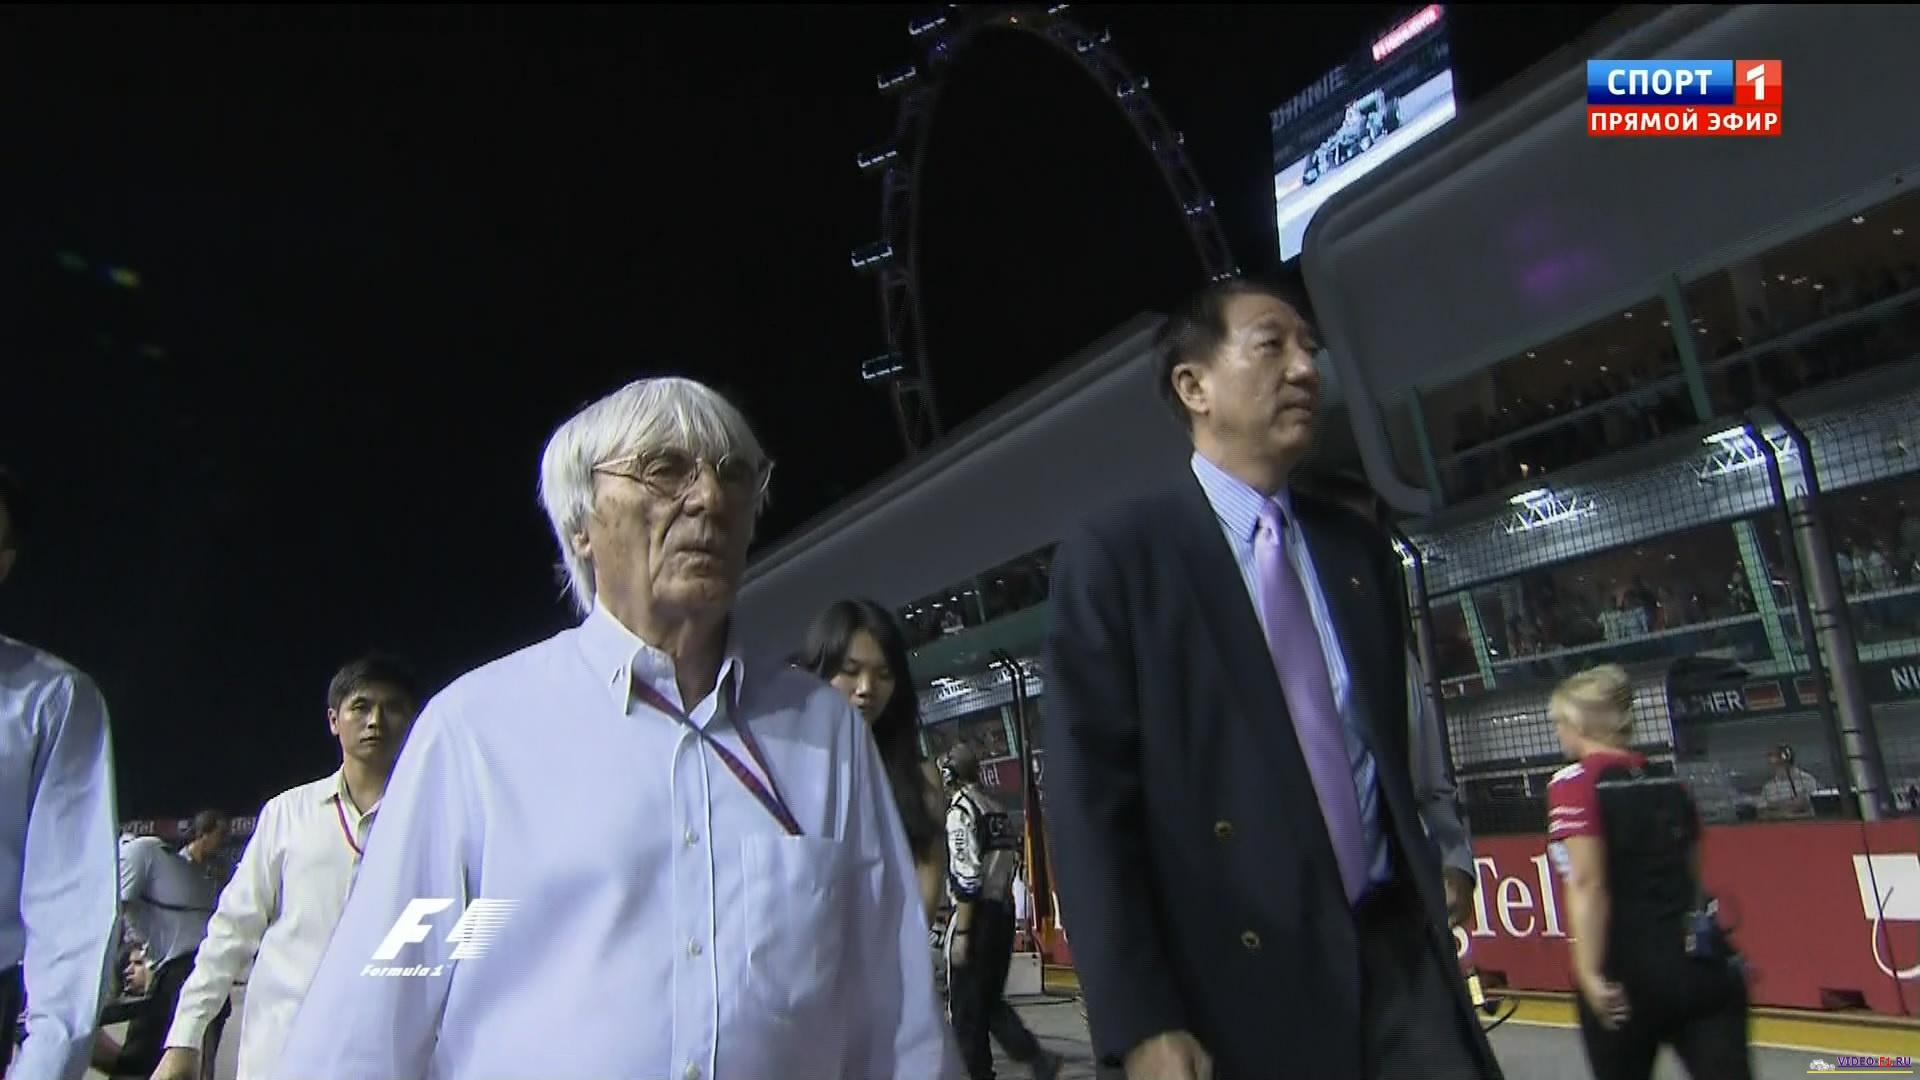 Формула 1 гран при сингапура 2011 гонка 13 фотография